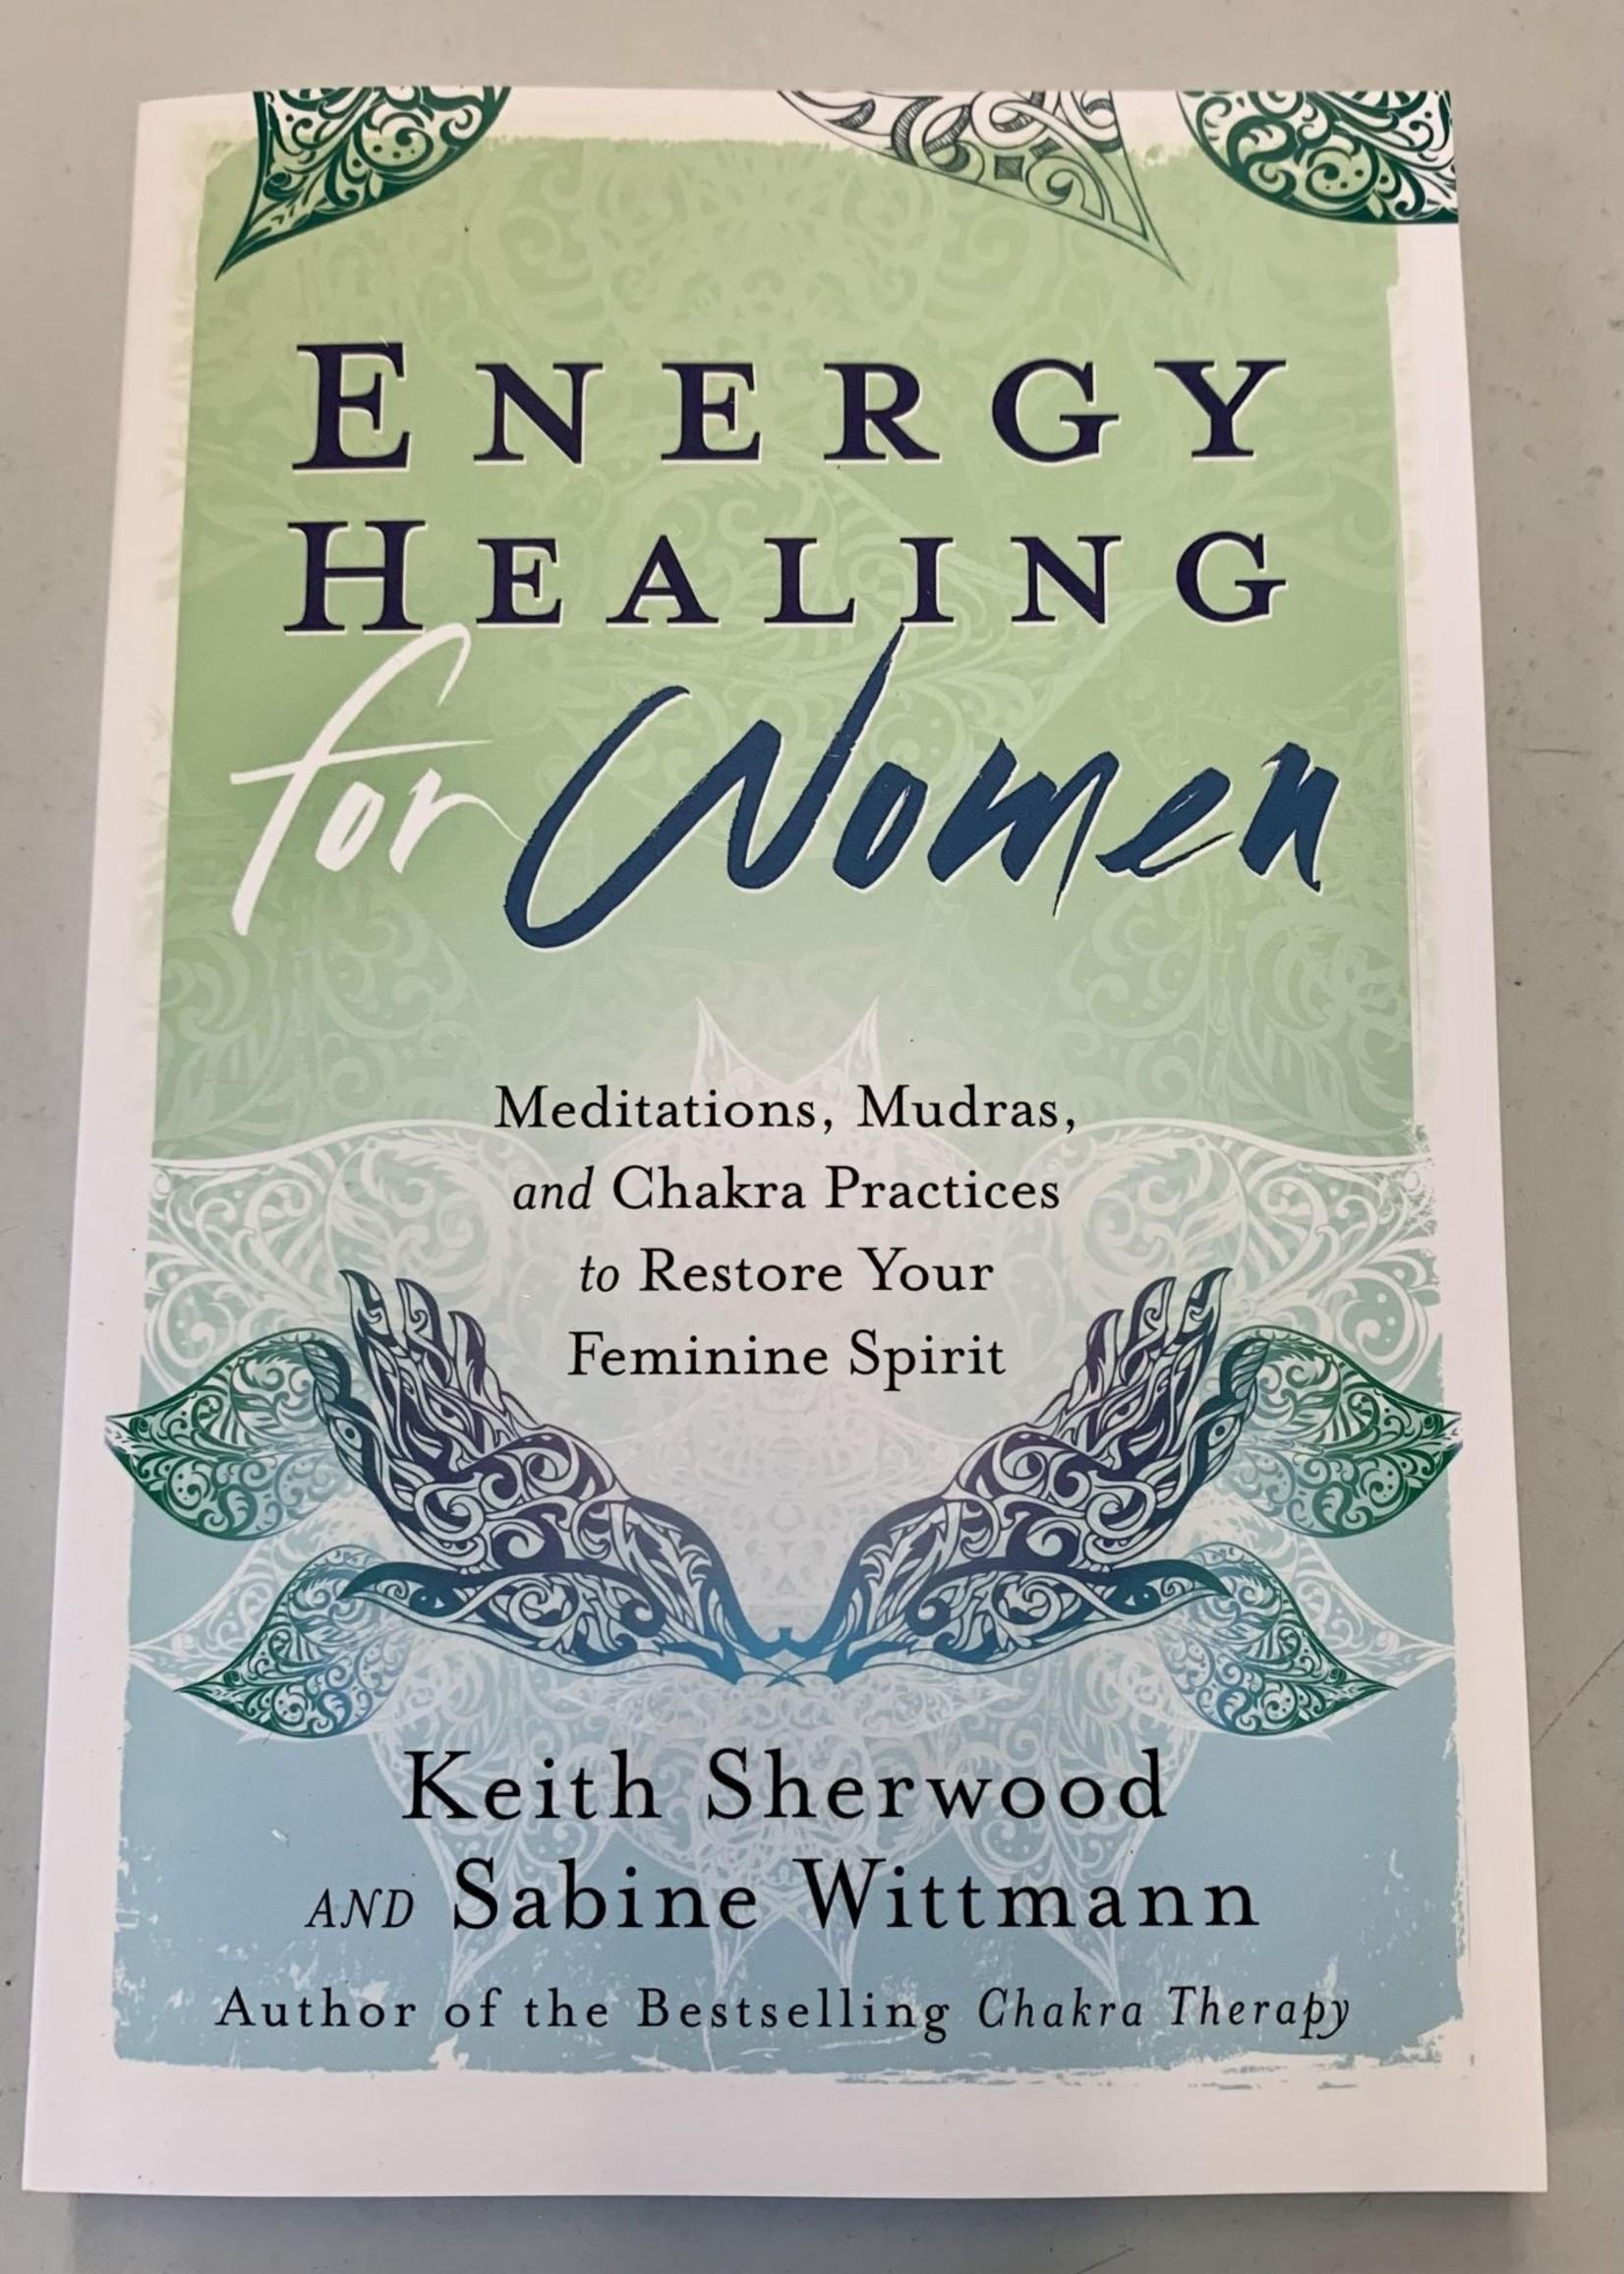 Energy Healing for Women - BY KEITH SHERWOOD, SABINE WITTMANN